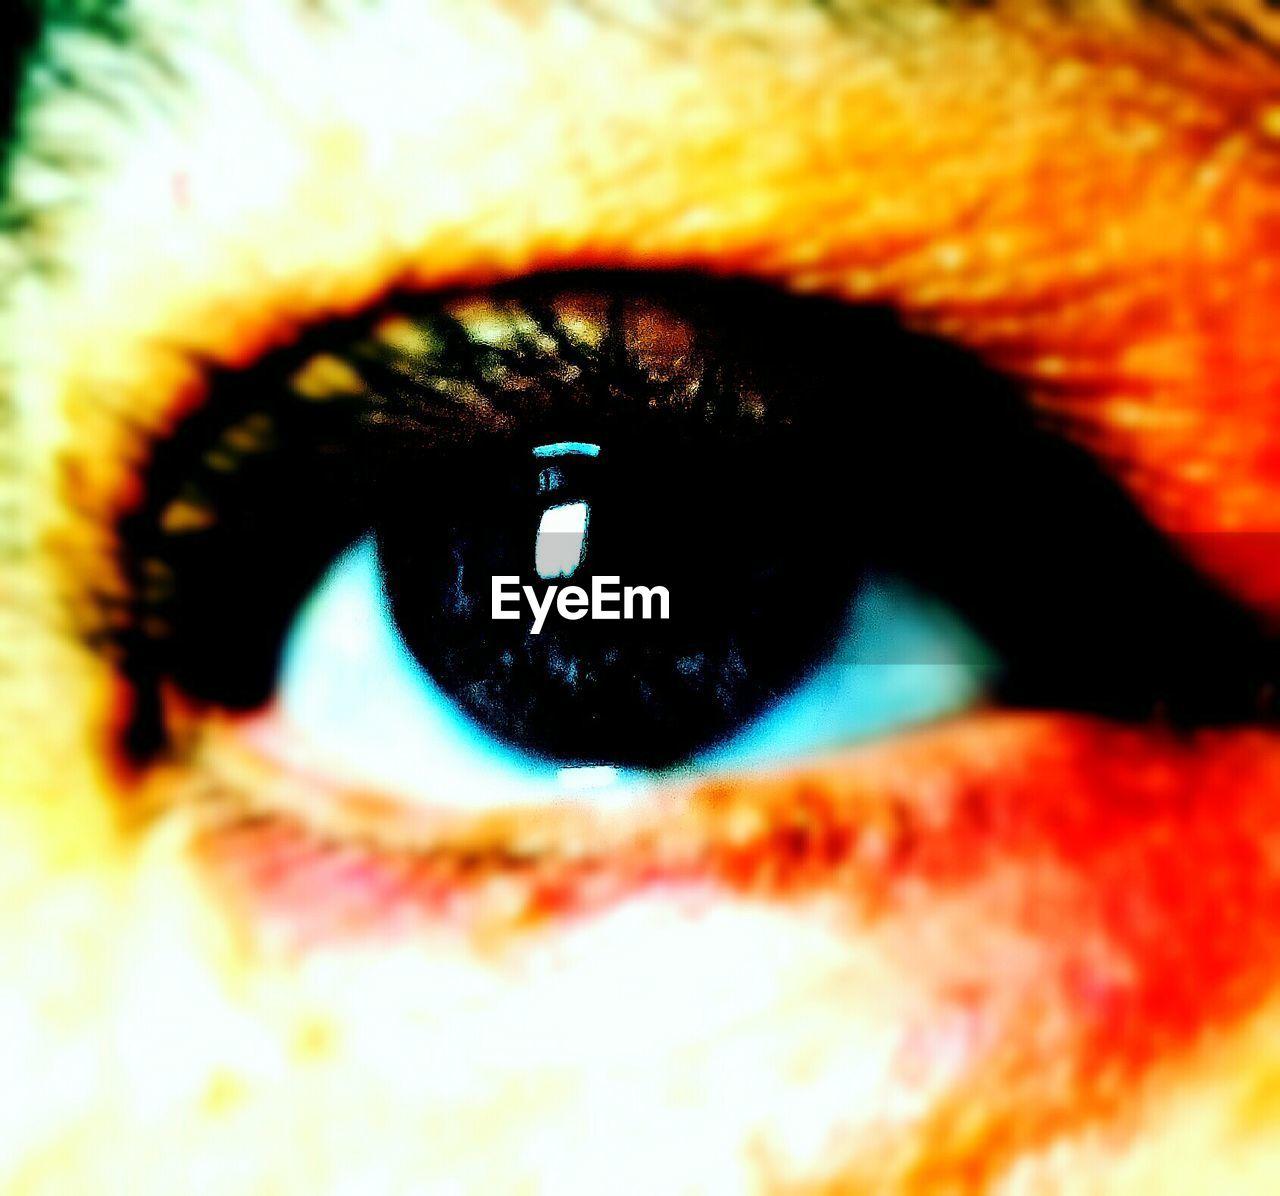 human eye, eyelash, real people, human body part, one person, eyesight, eyeball, sensory perception, iris - eye, close-up, full frame, portrait, looking at camera, outdoors, day, adult, people